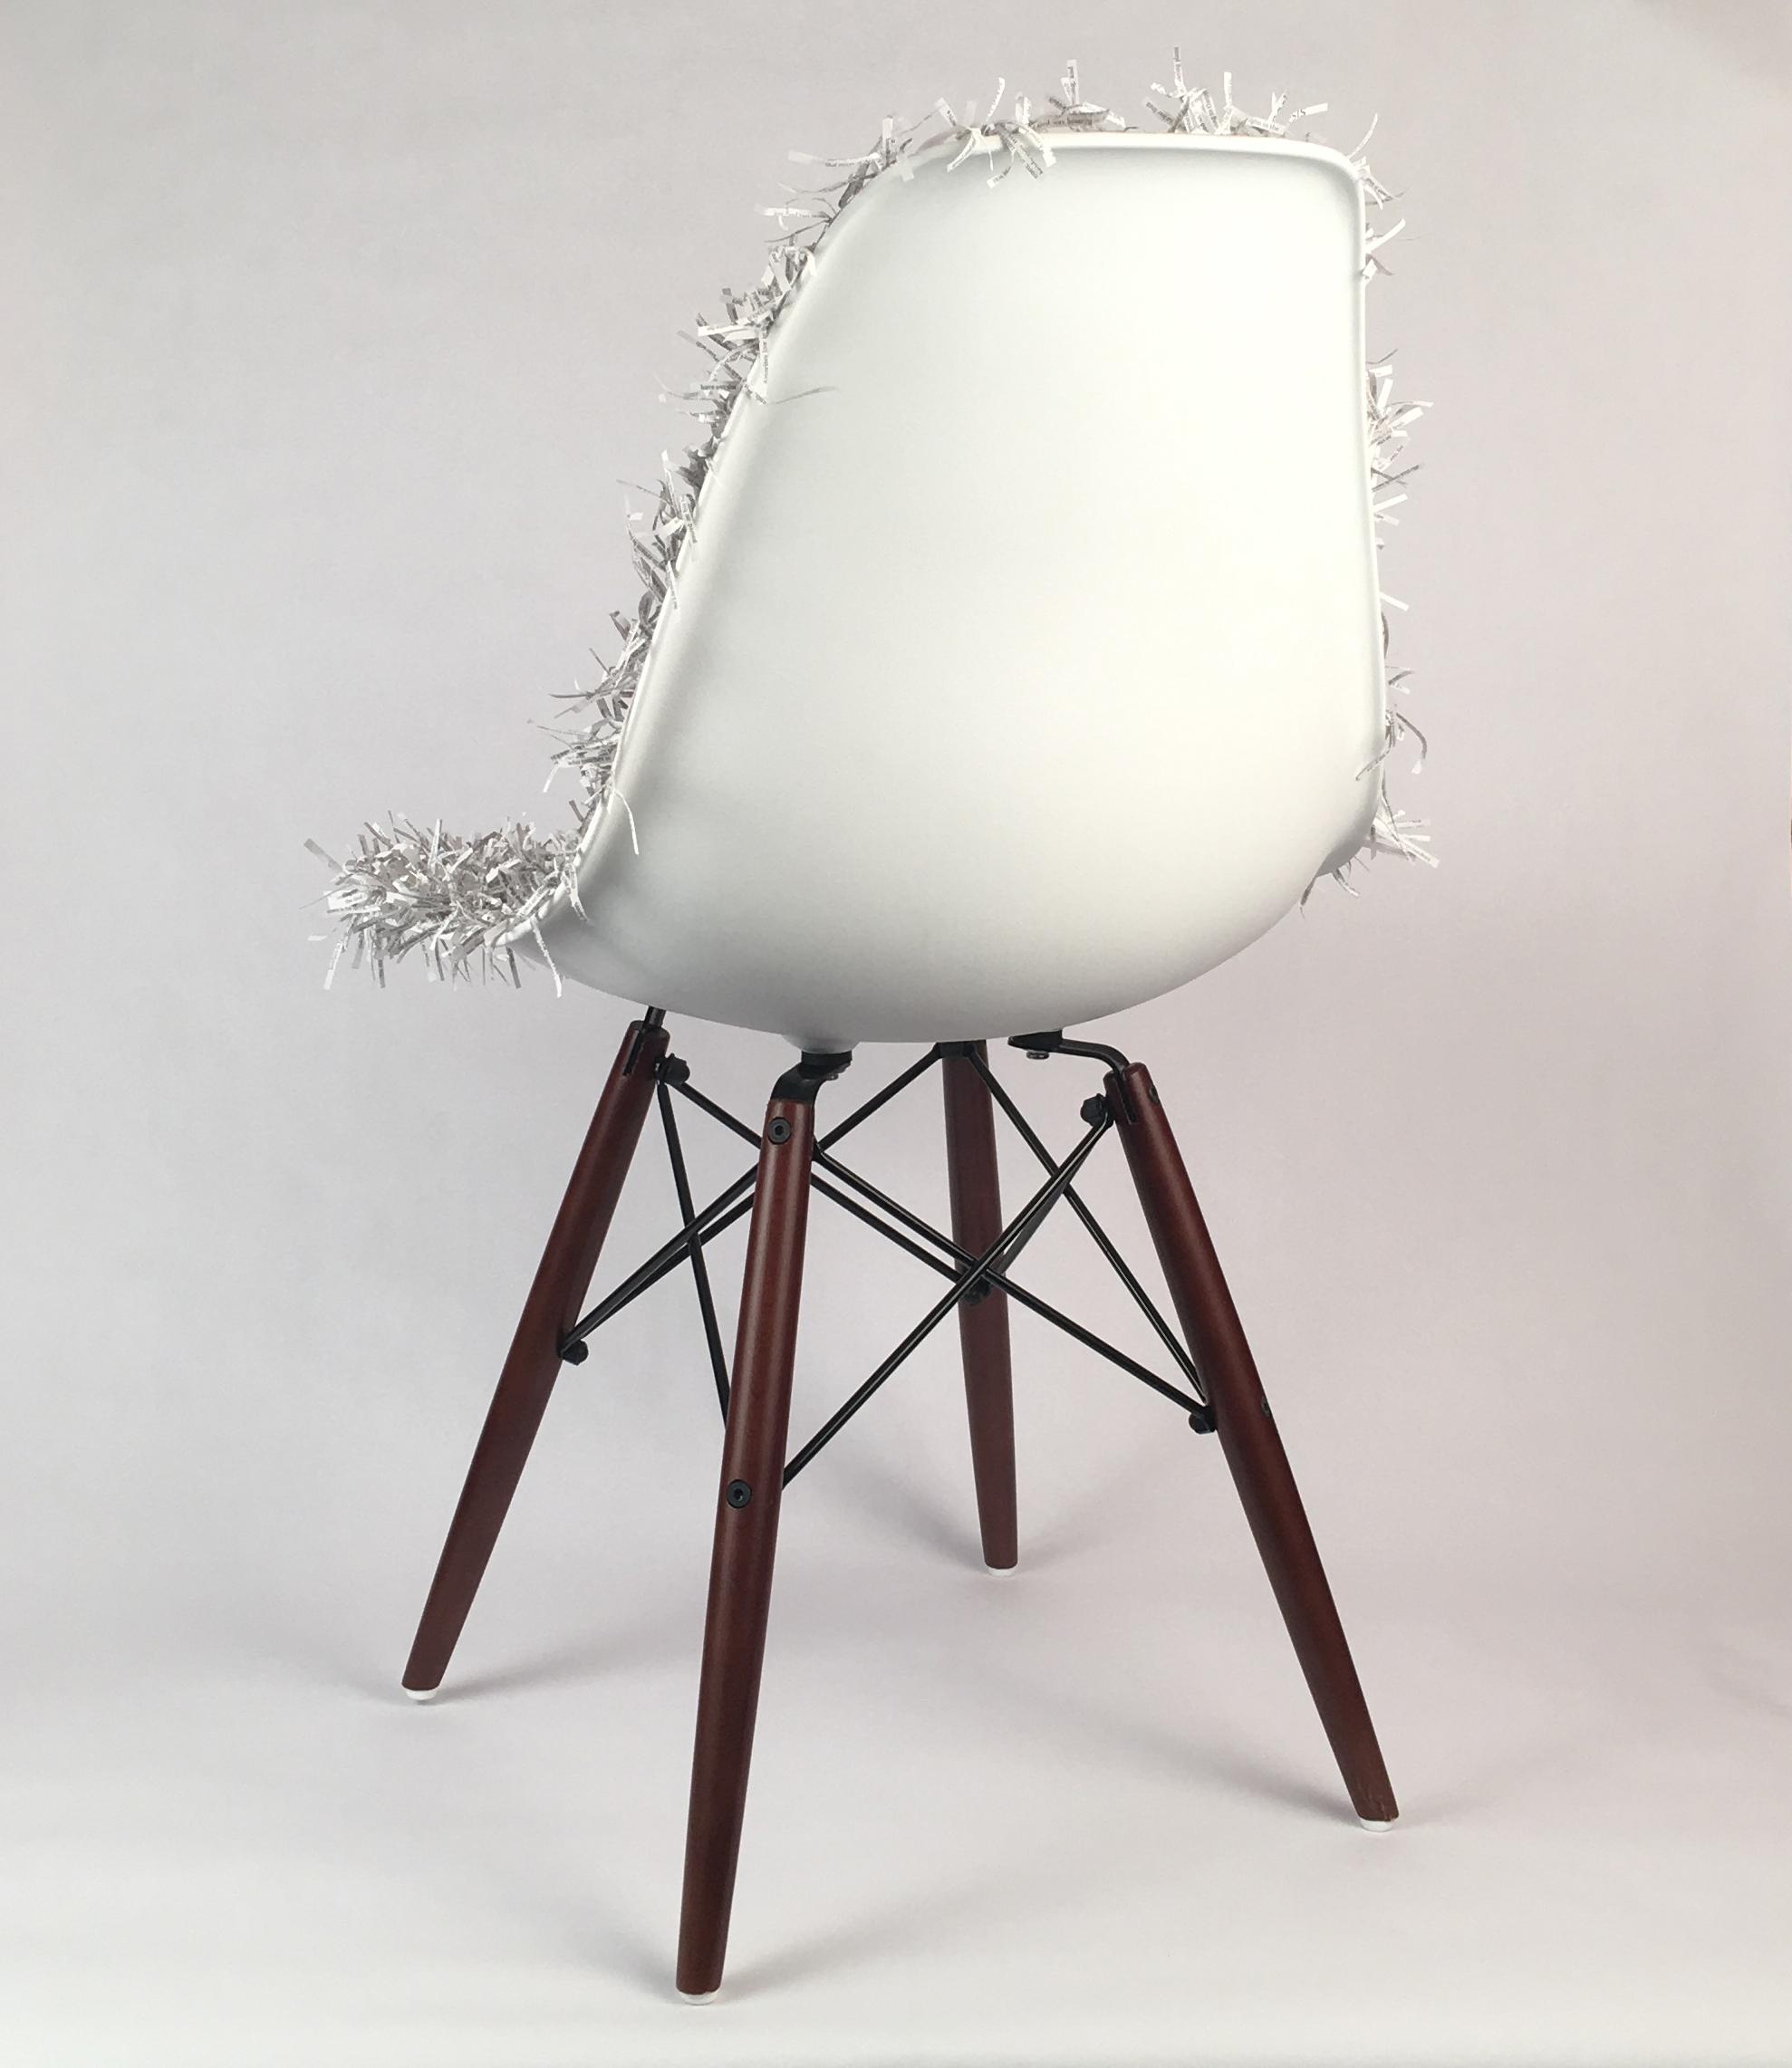 jeffrey augustine songco holmol chair 2